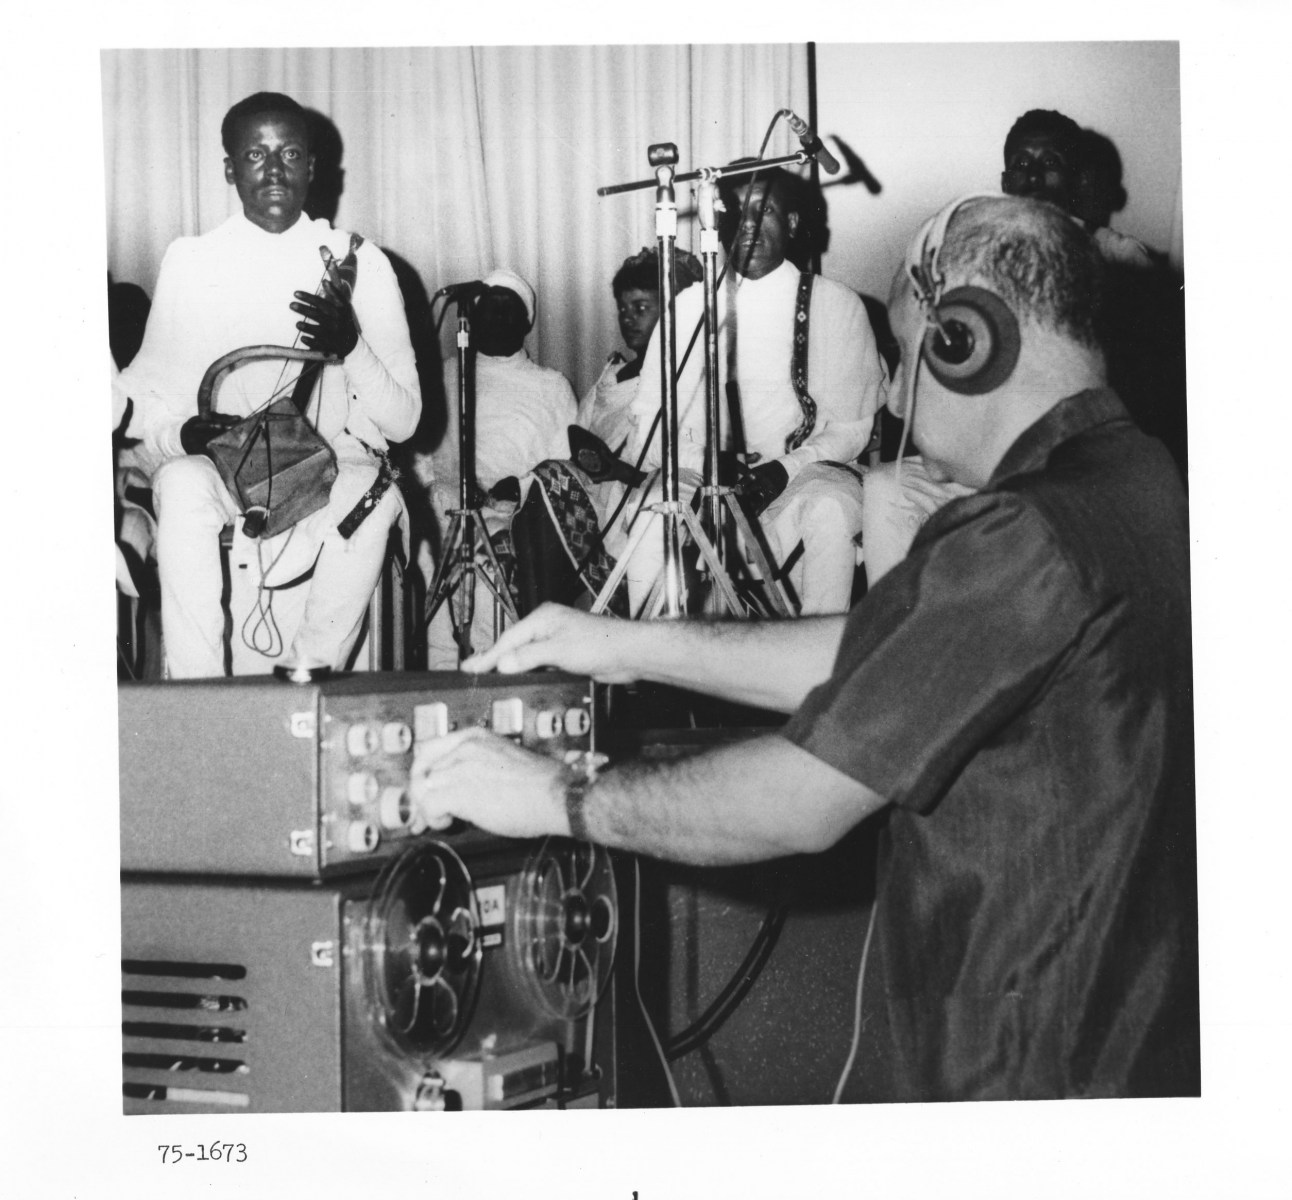 2b-Leo-recording-in-Africa-2